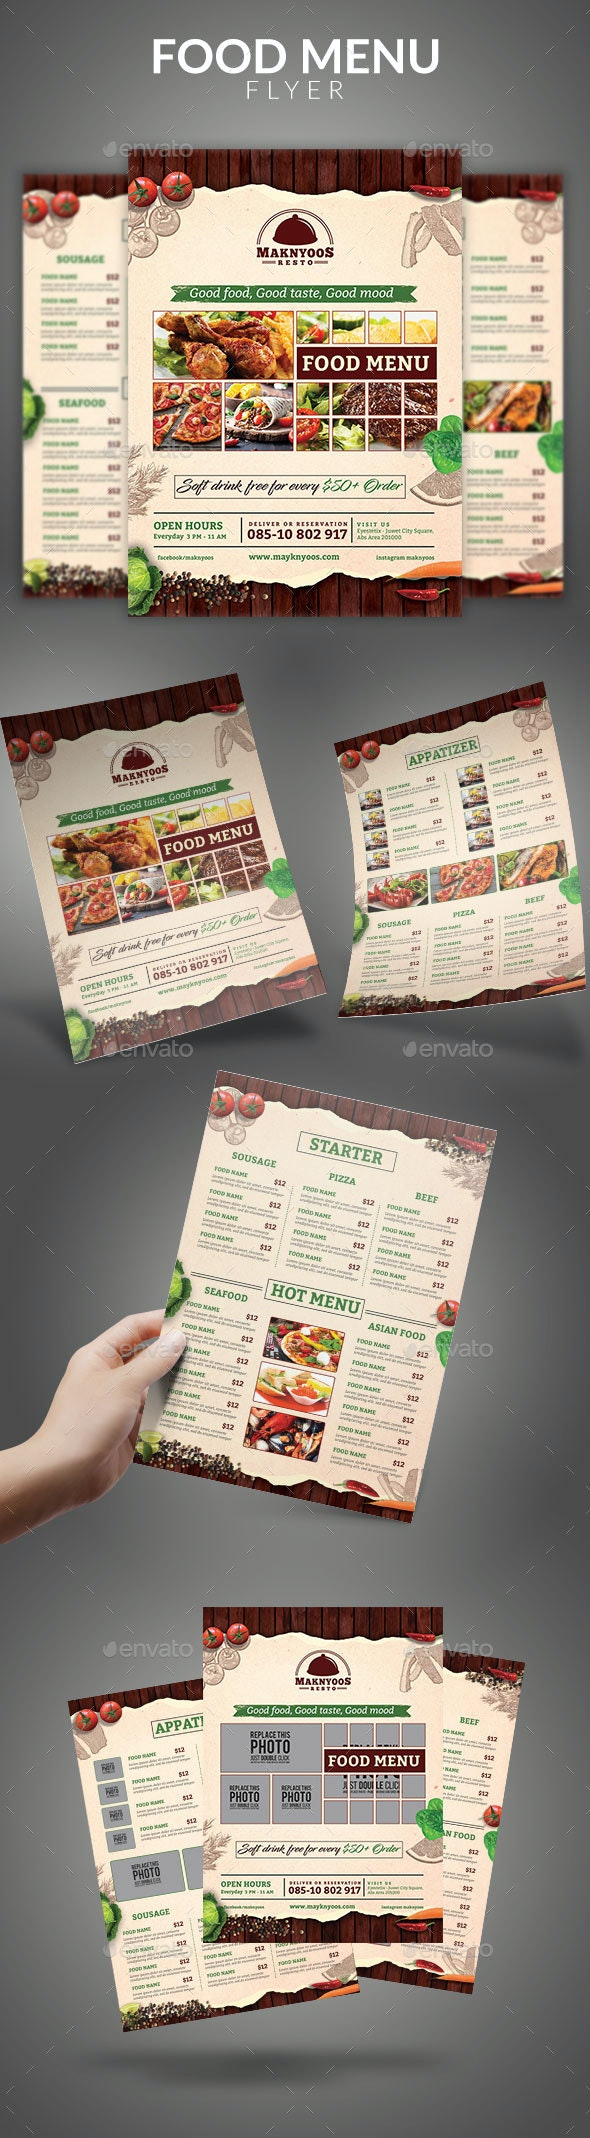 Food Menu Flyer - Food Menus Print Templates